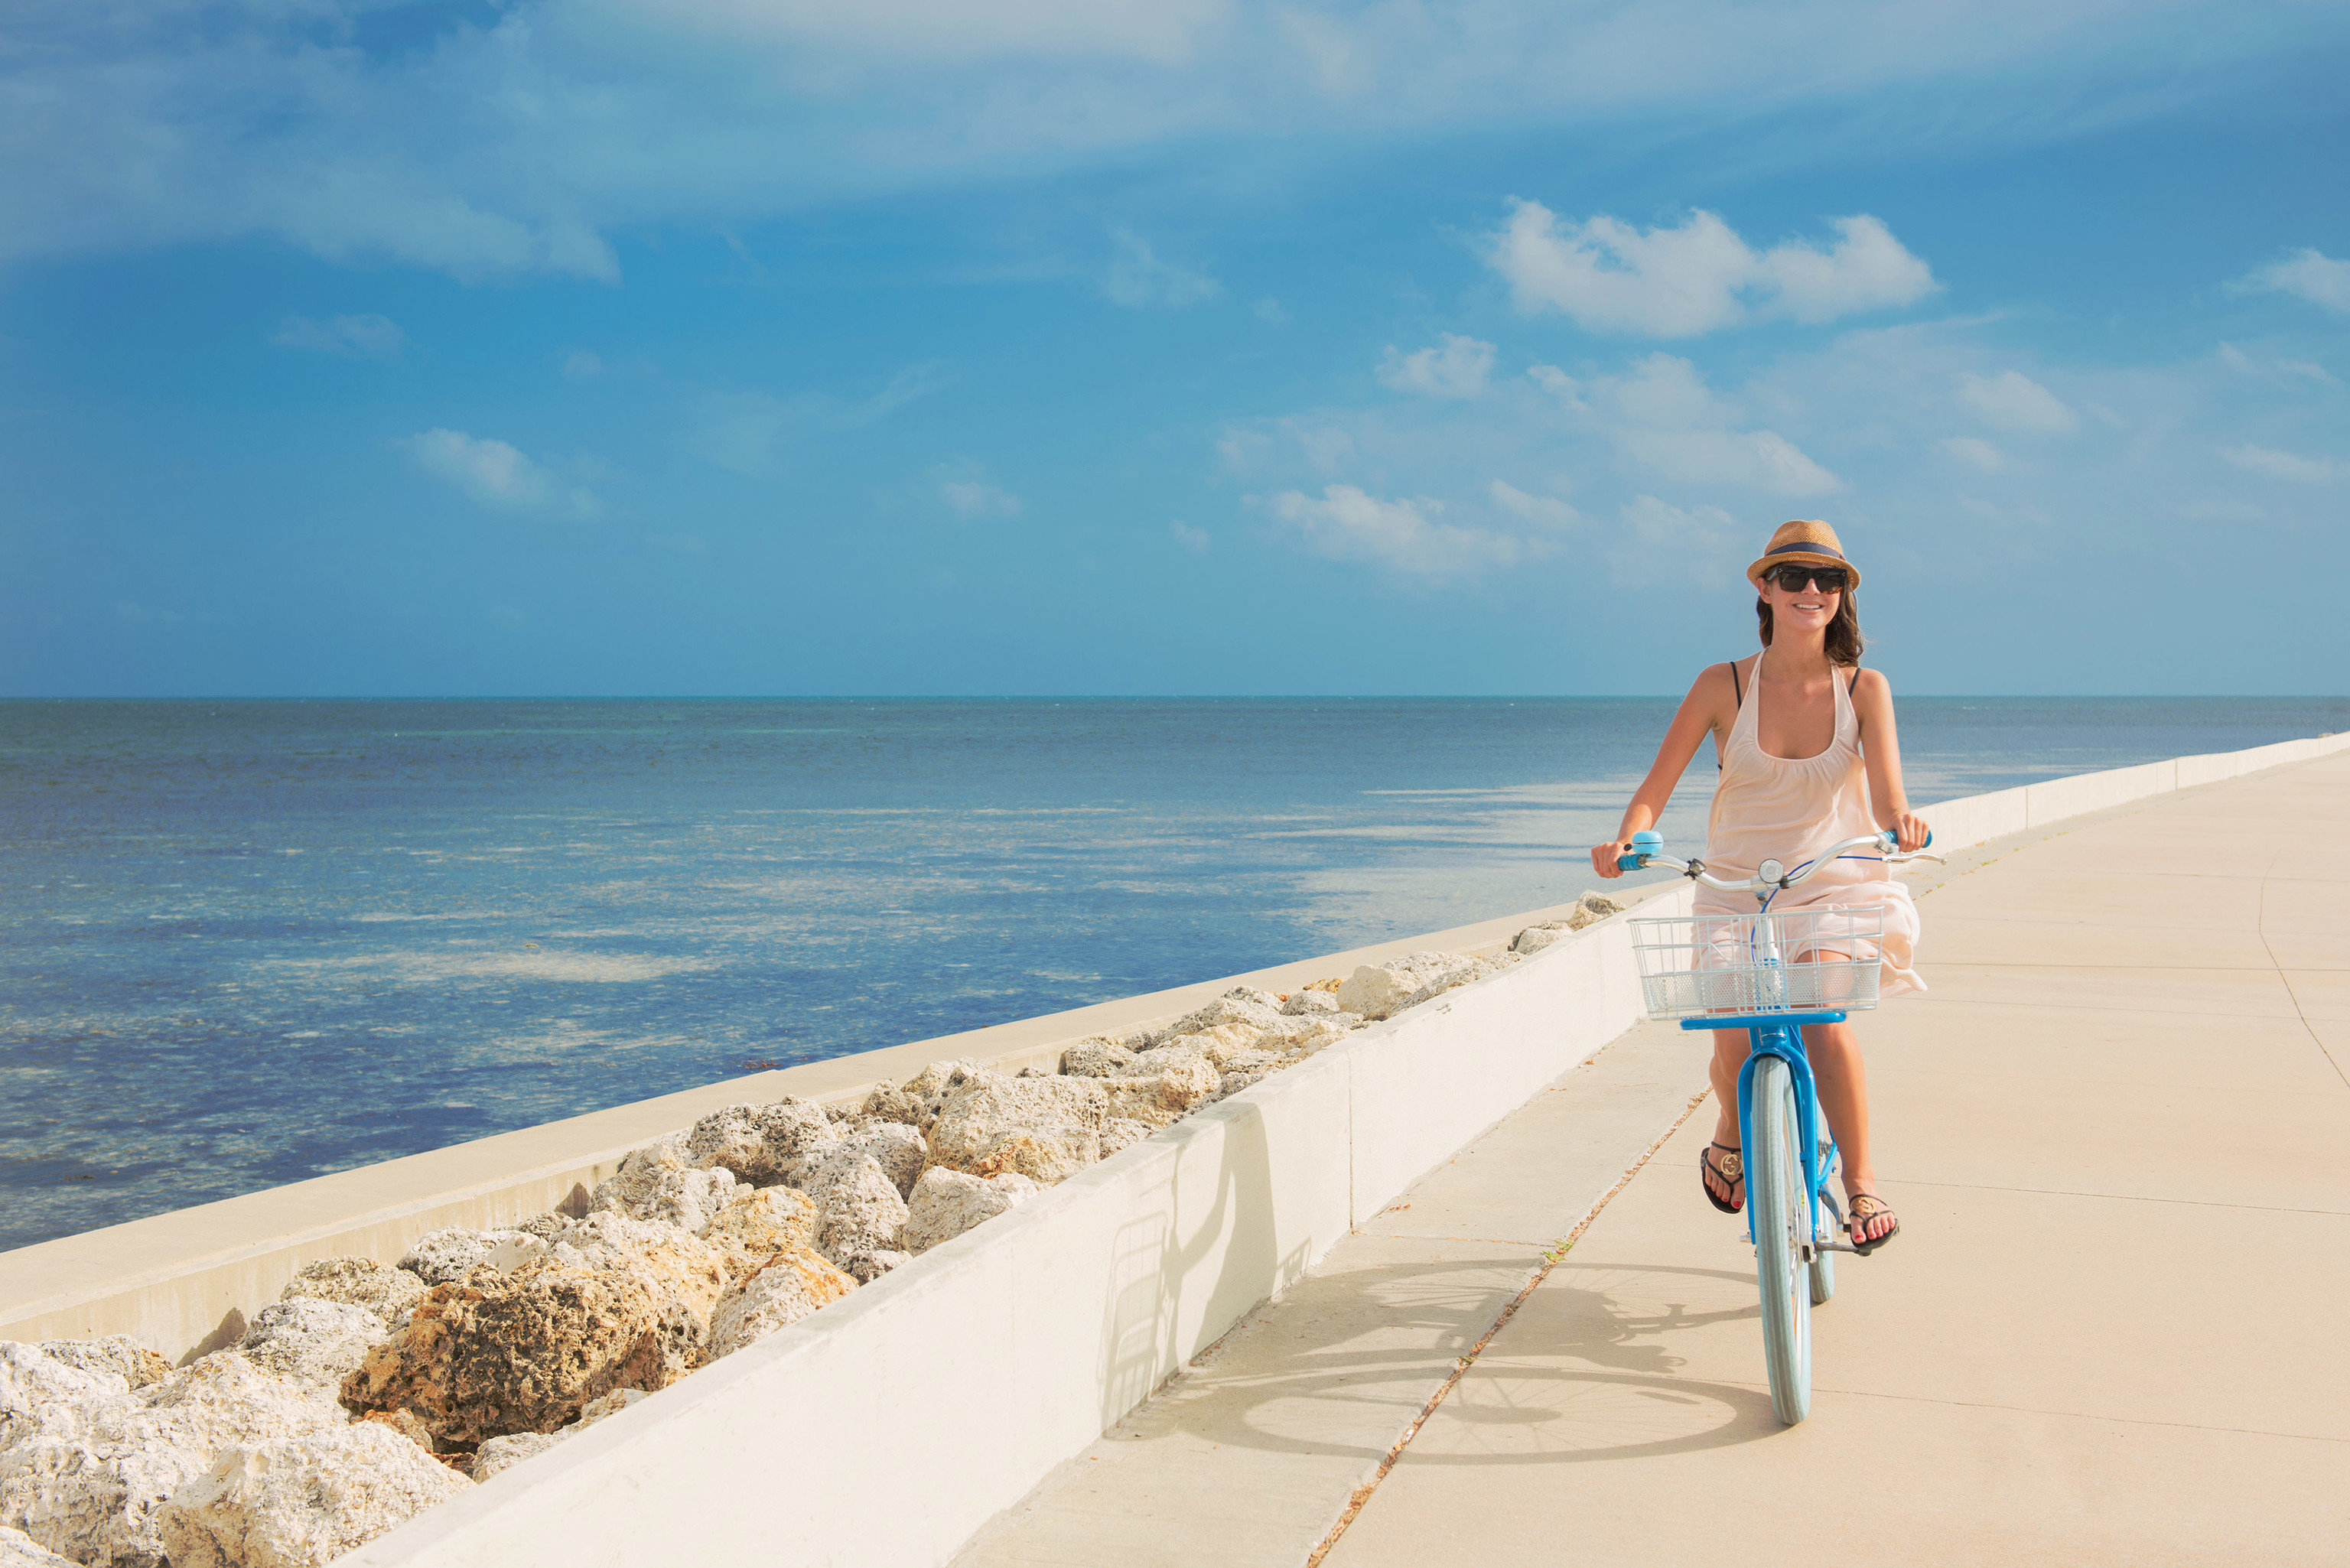 sky water Beach Sea shore blue Ocean Coast Nature horizon sand caribbean cape wave